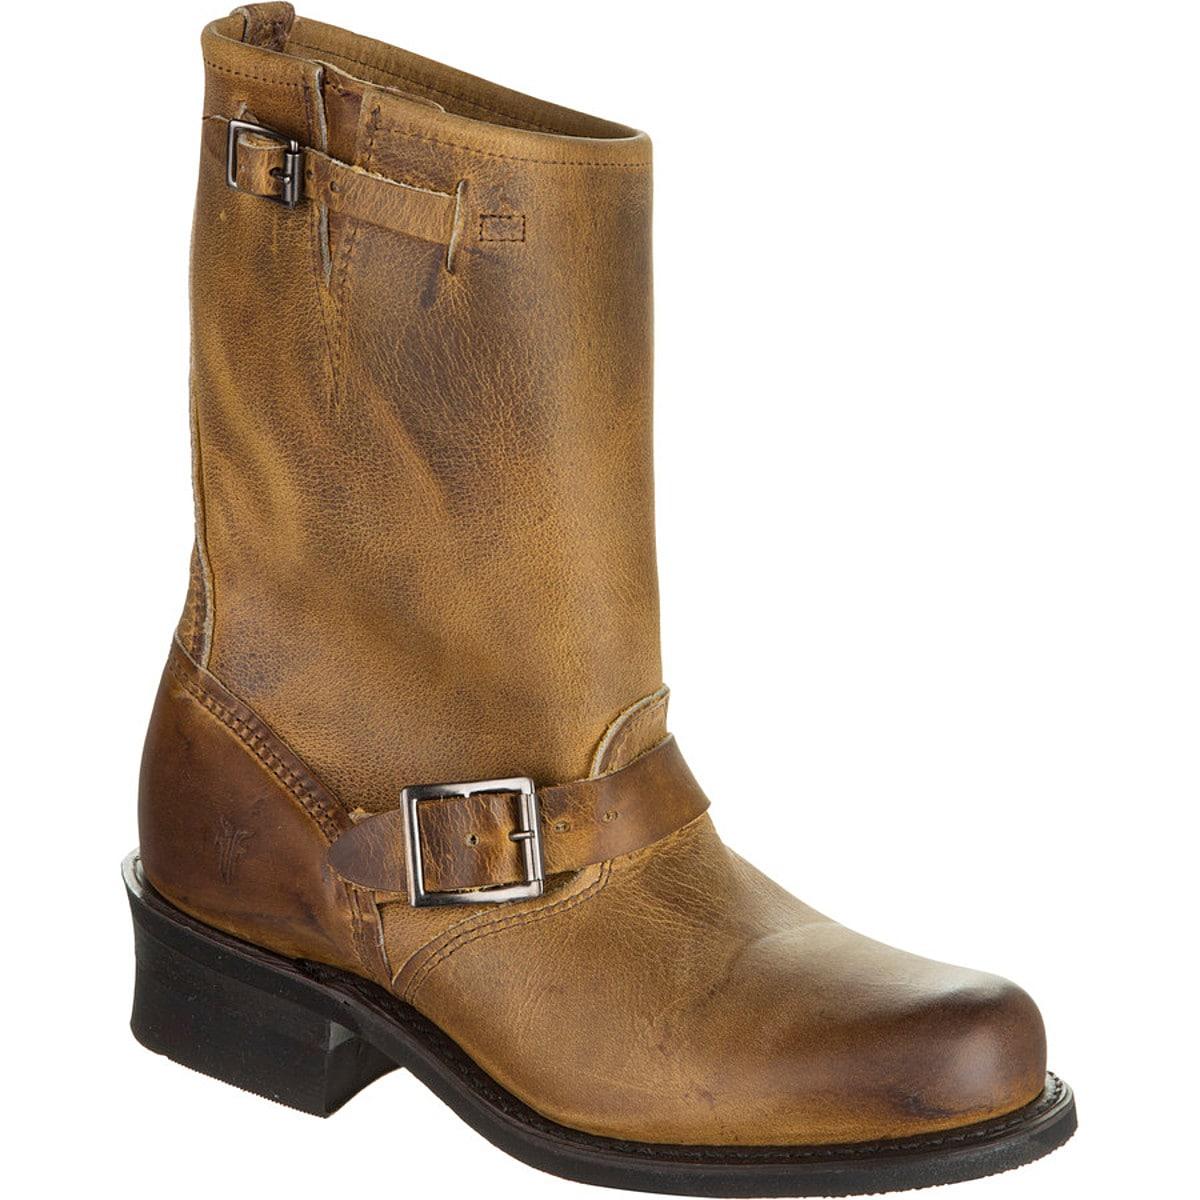 Frye Engineer 12R Boot - Women's